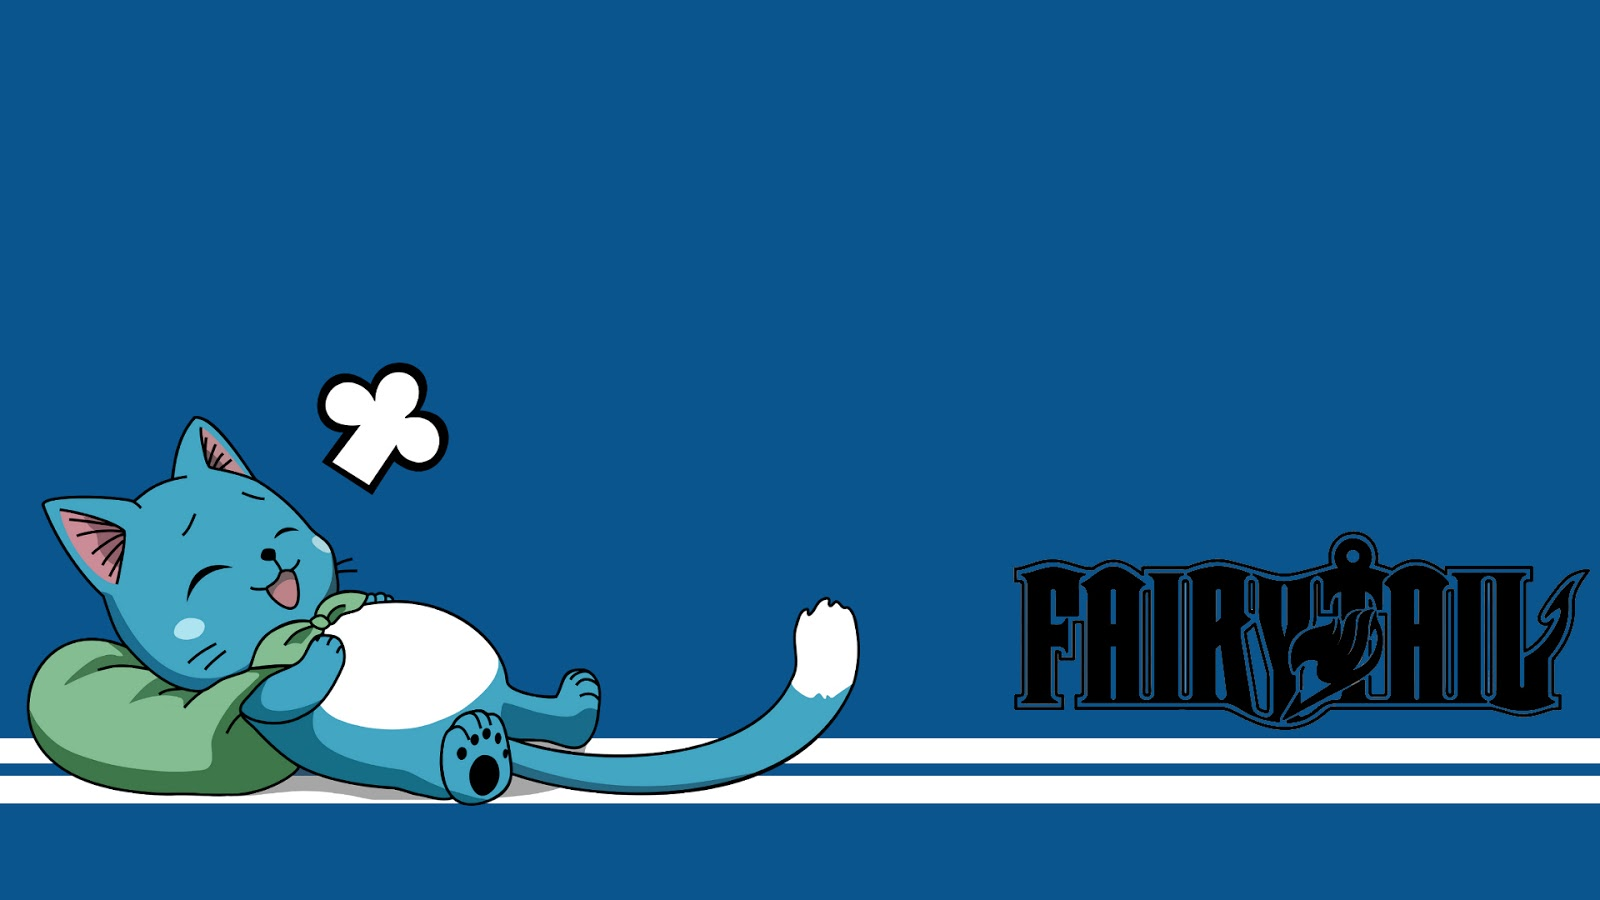 Fairy Tail Happy 32 HD Wallpaper 1600x900